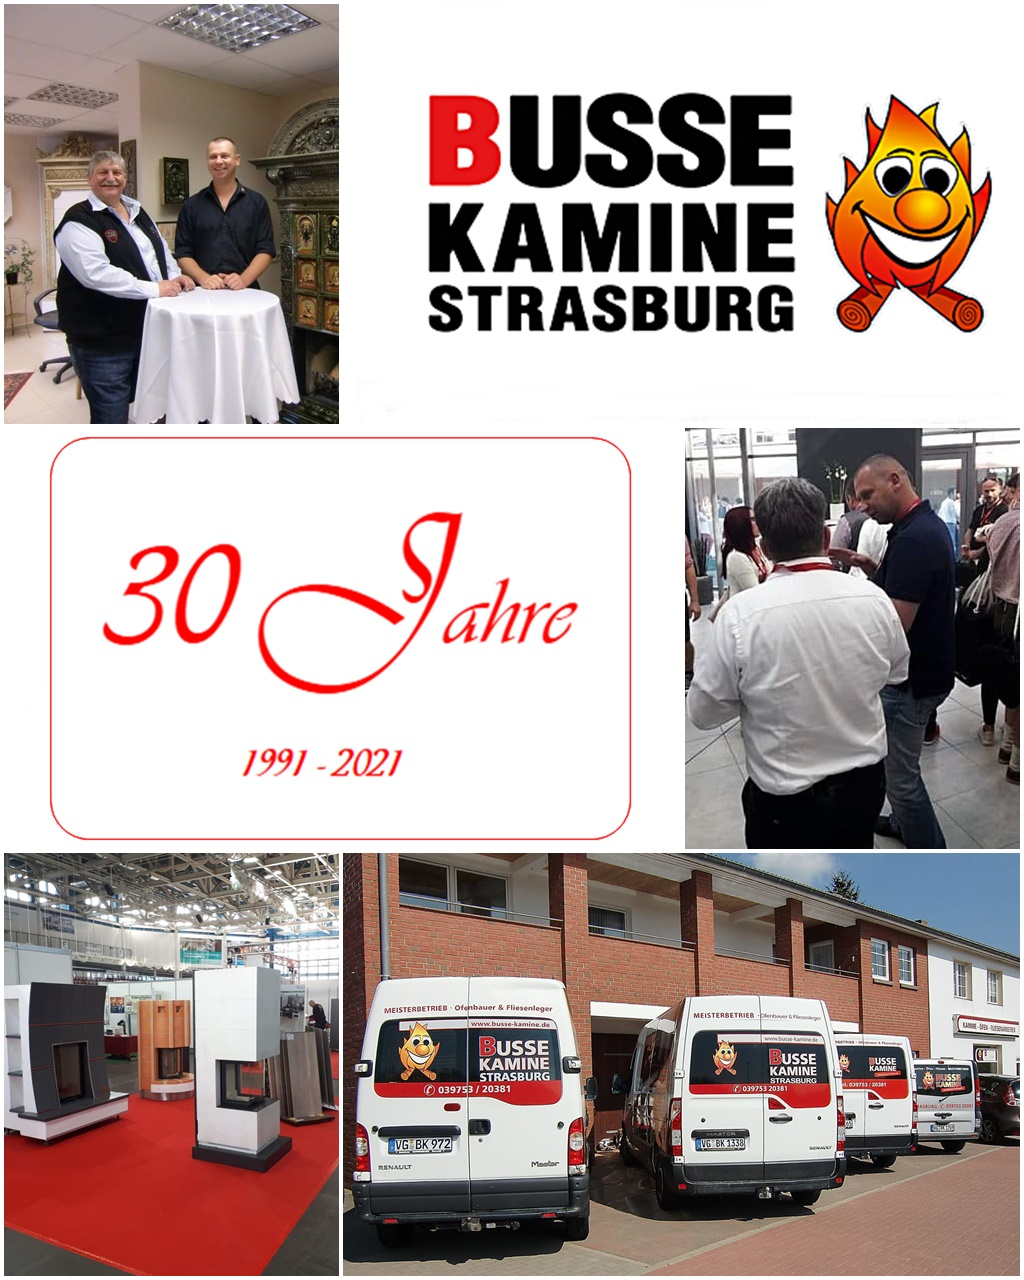 Busse Kamine Strasburg 30 Jahre Jubiläum Familienbetrieb Ofenbau Kaminbau